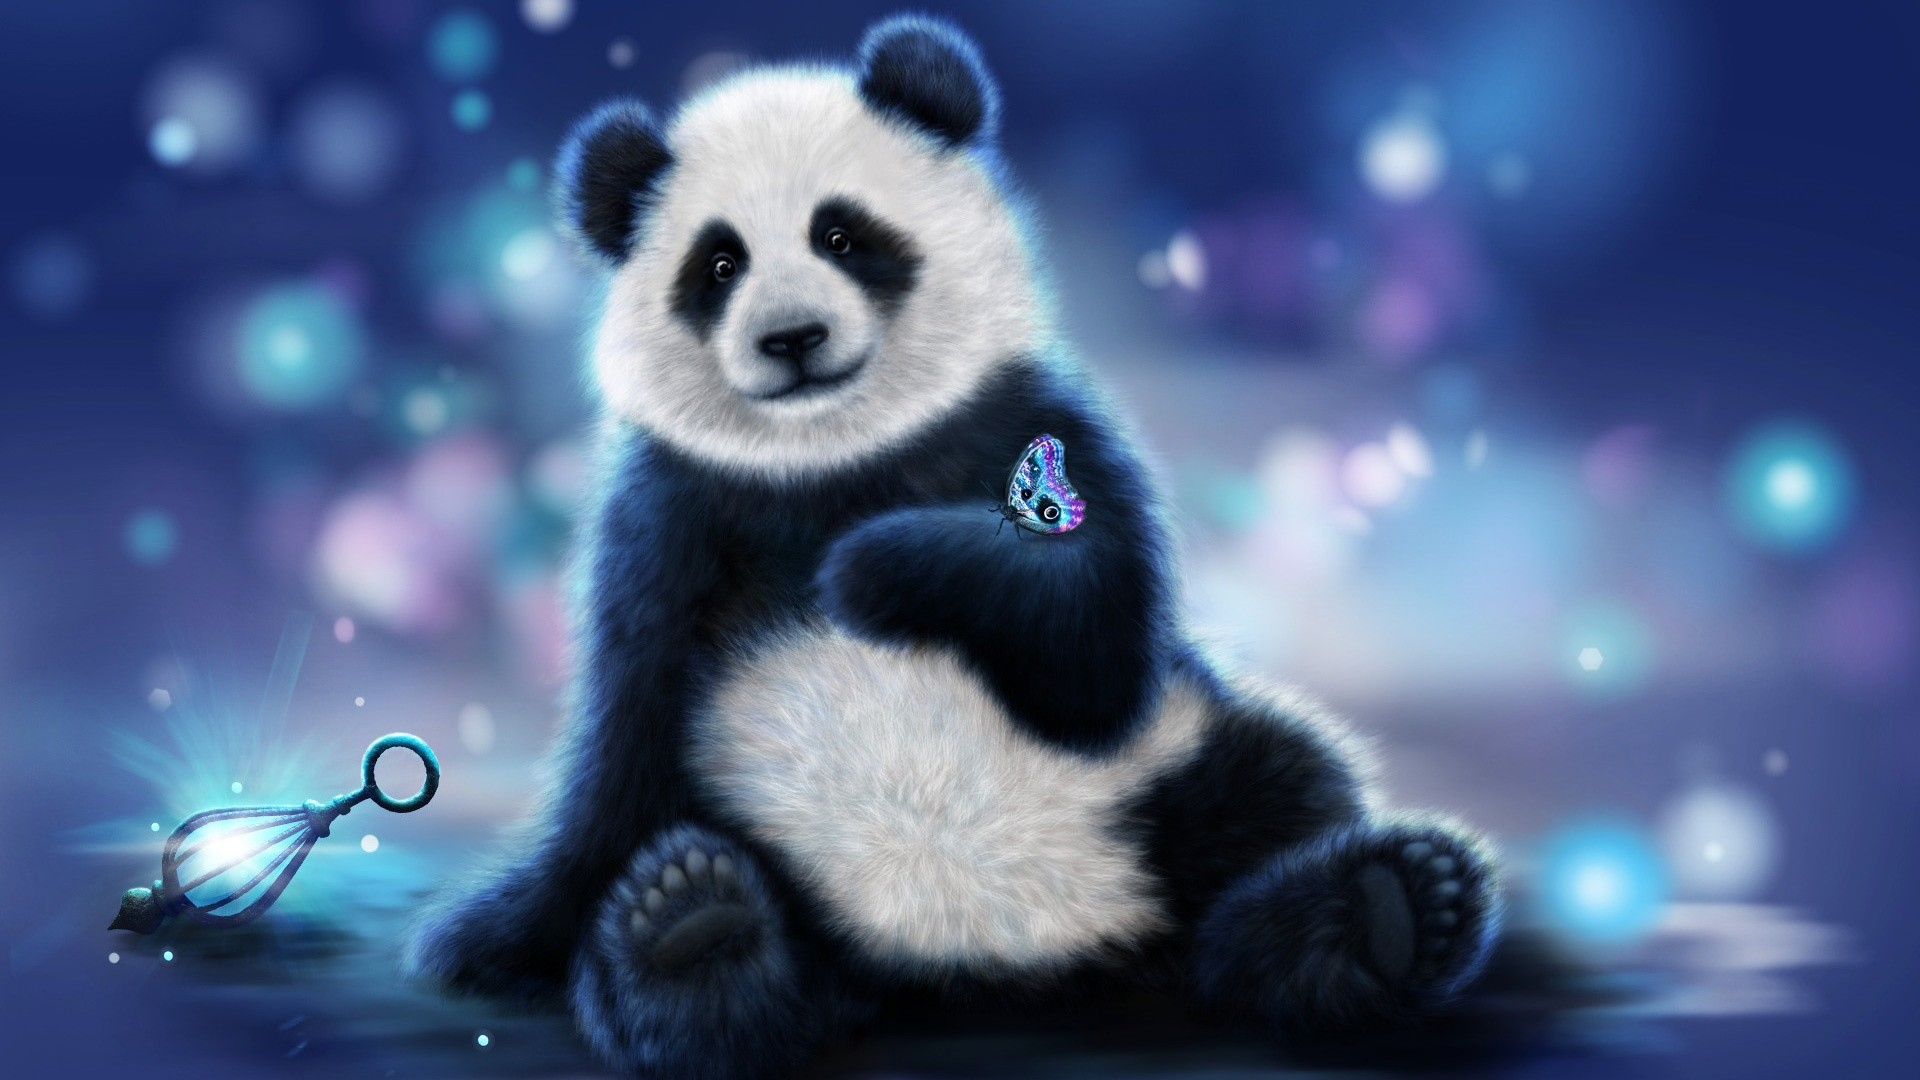 Lovable Panda Bear HD Wallpaper Free Download   New HD Wallpapers .